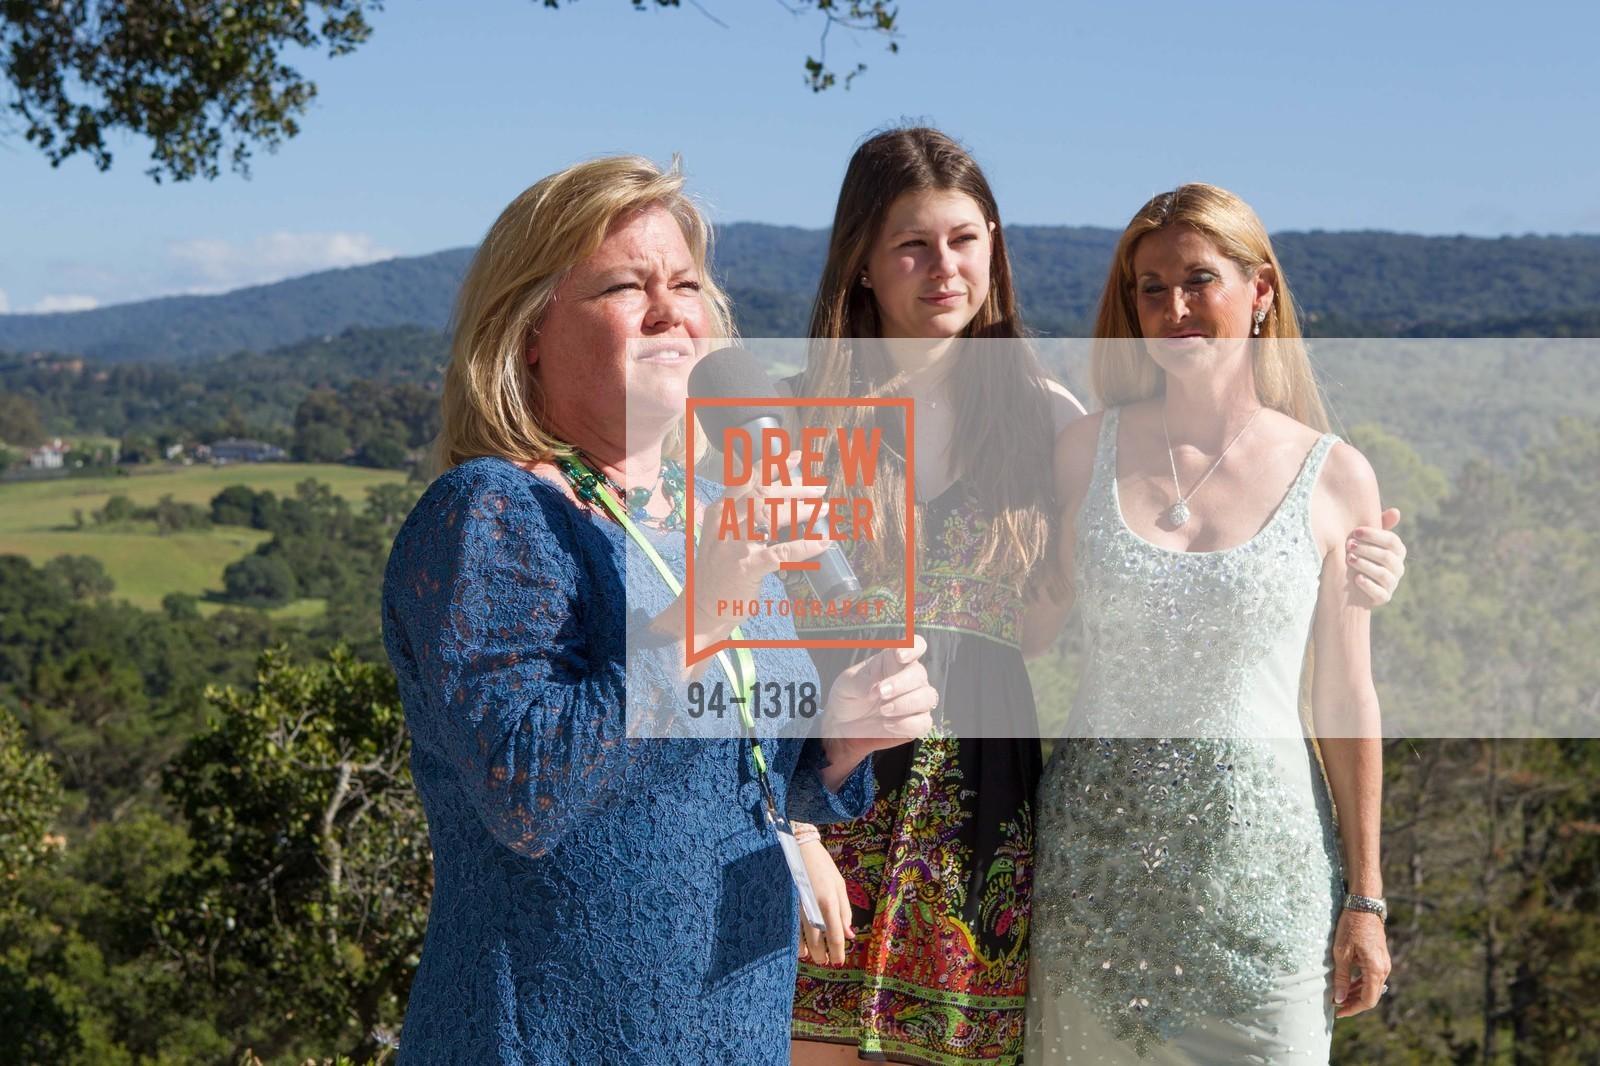 Linda Giampa, Kyla Cagan, Sherry Cagan, Photo #94-1318